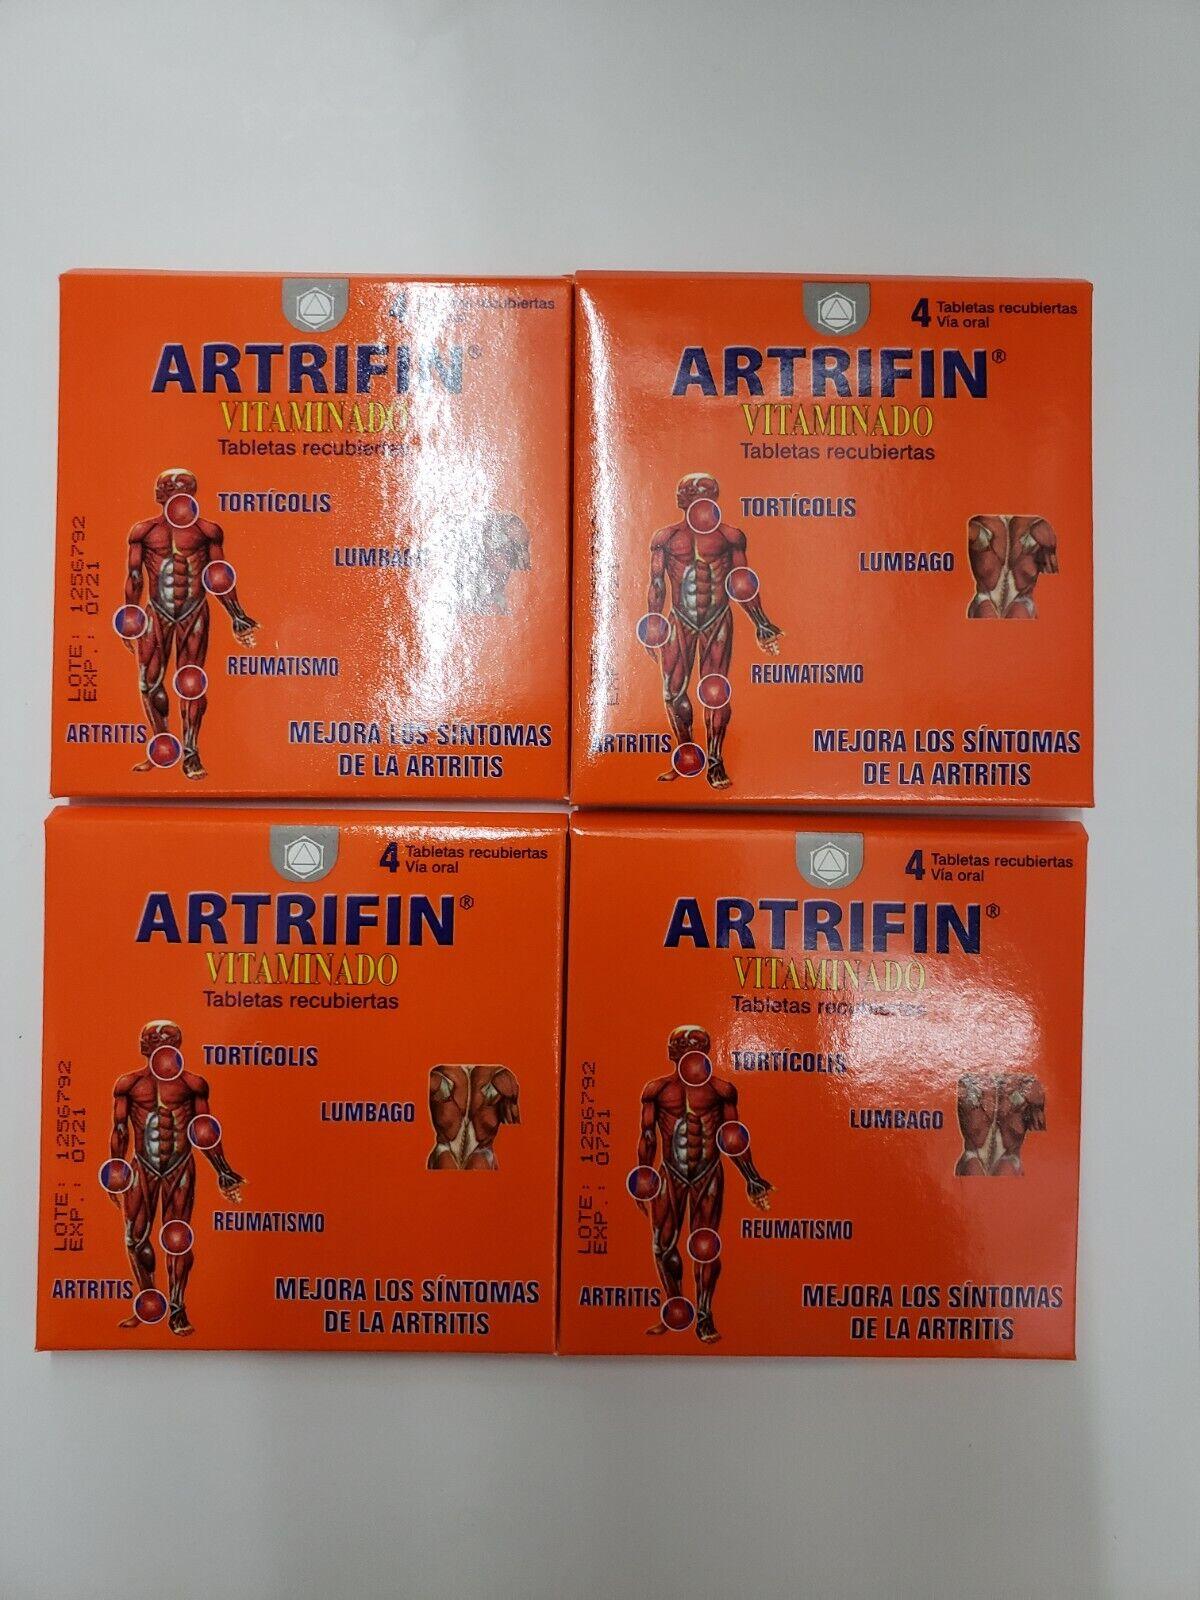 16 pastillas de Artrifin  Vitaminado